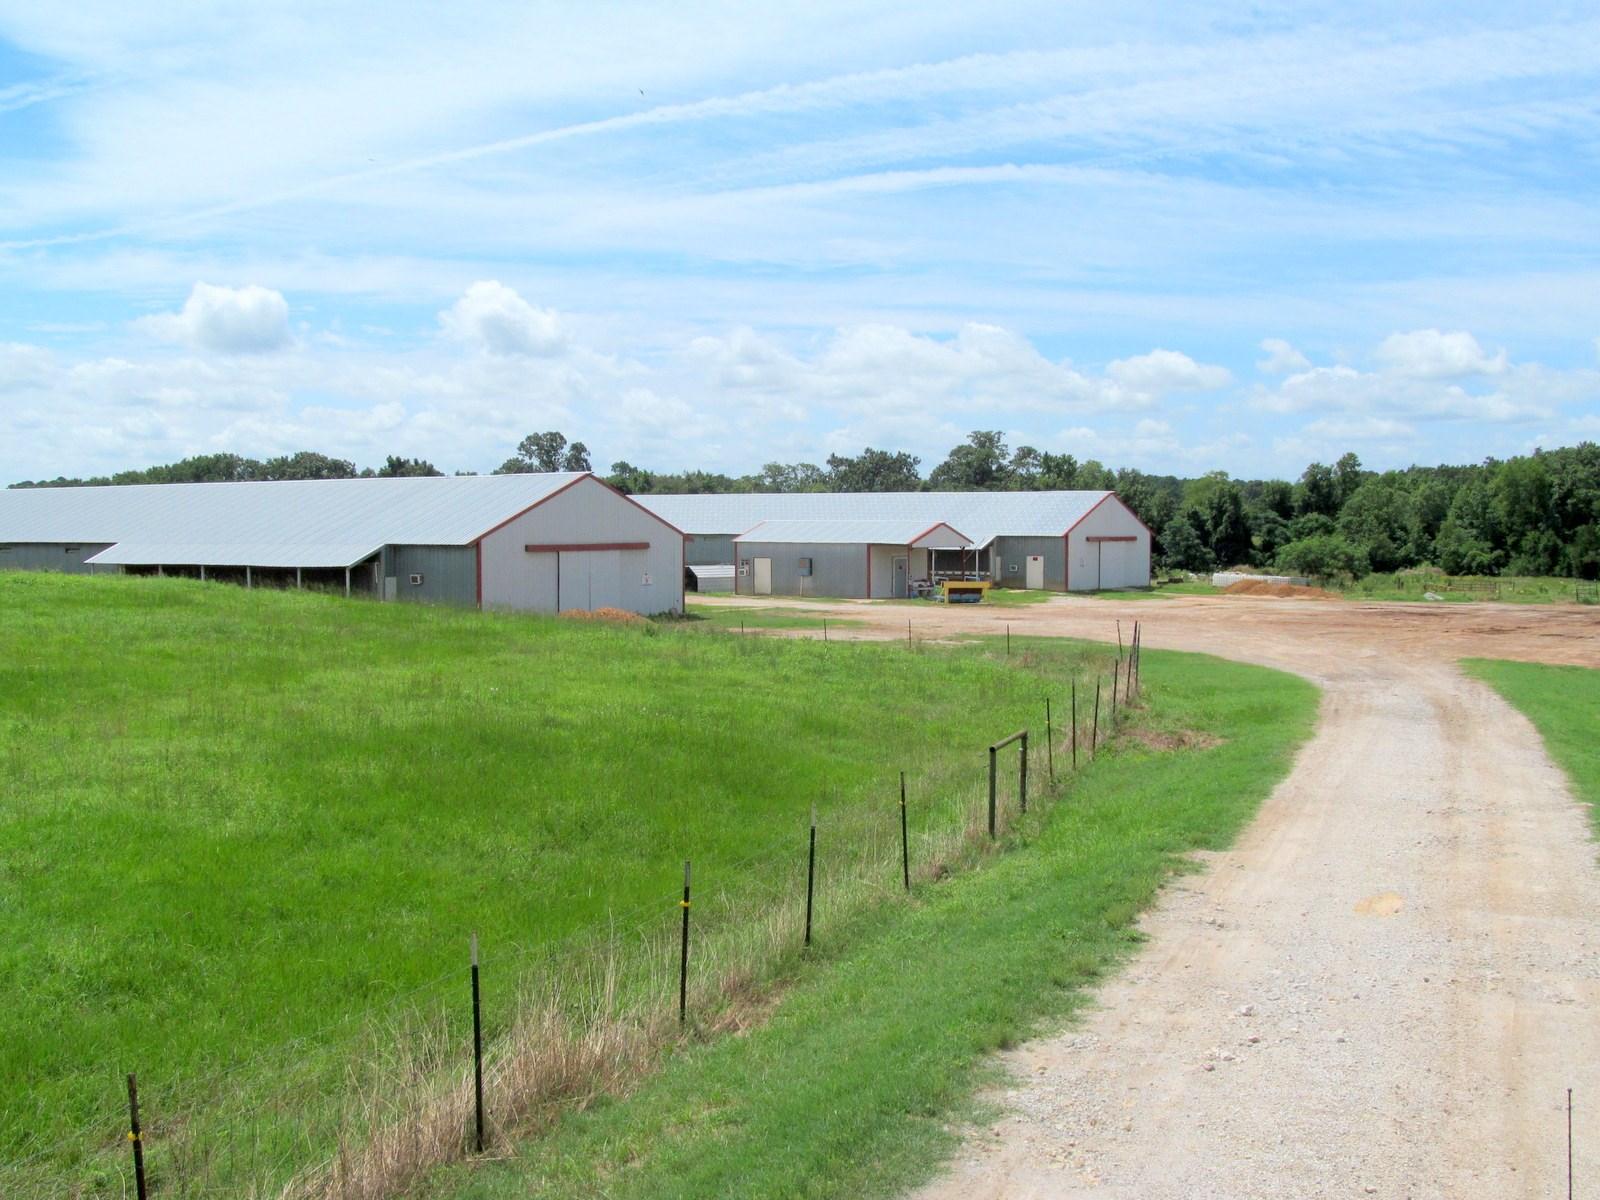 EAST TEXAS ACREAGE & POULTRY BREEDER FARM FRANKLIN COUNTY